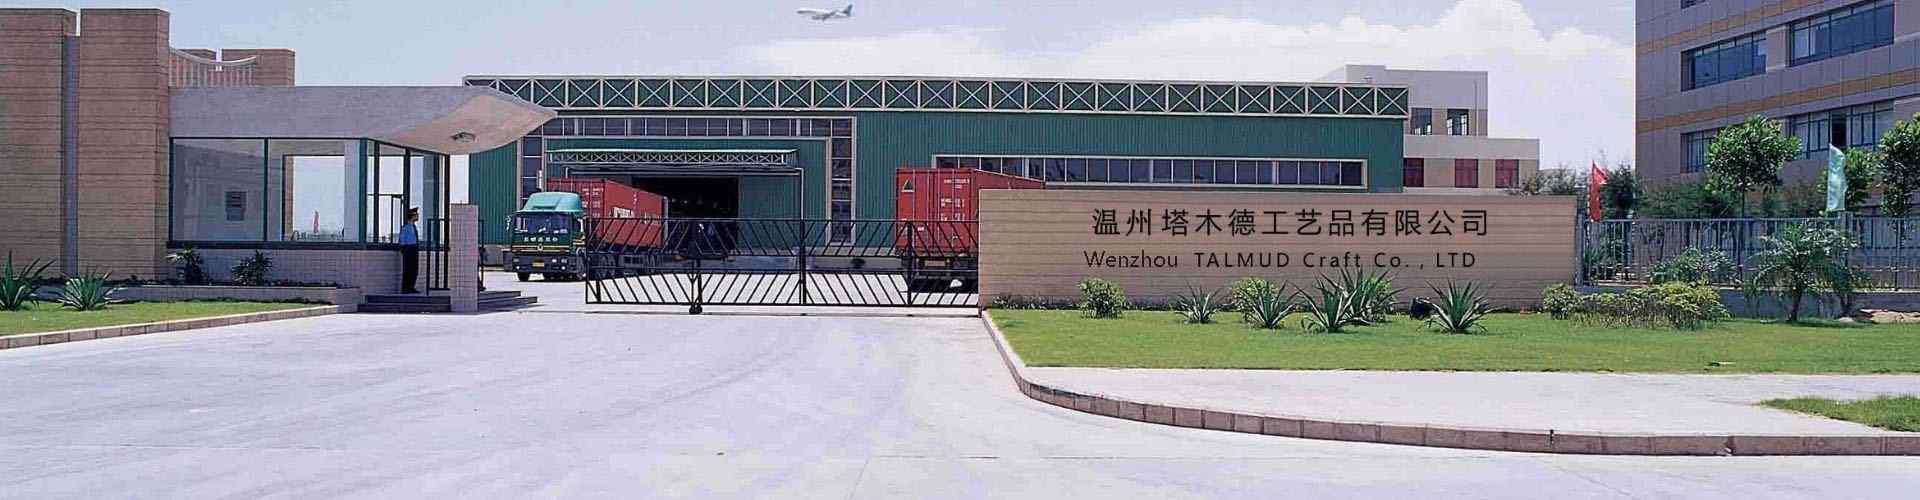 Wenzhou TALMUD Craft Co., LTD